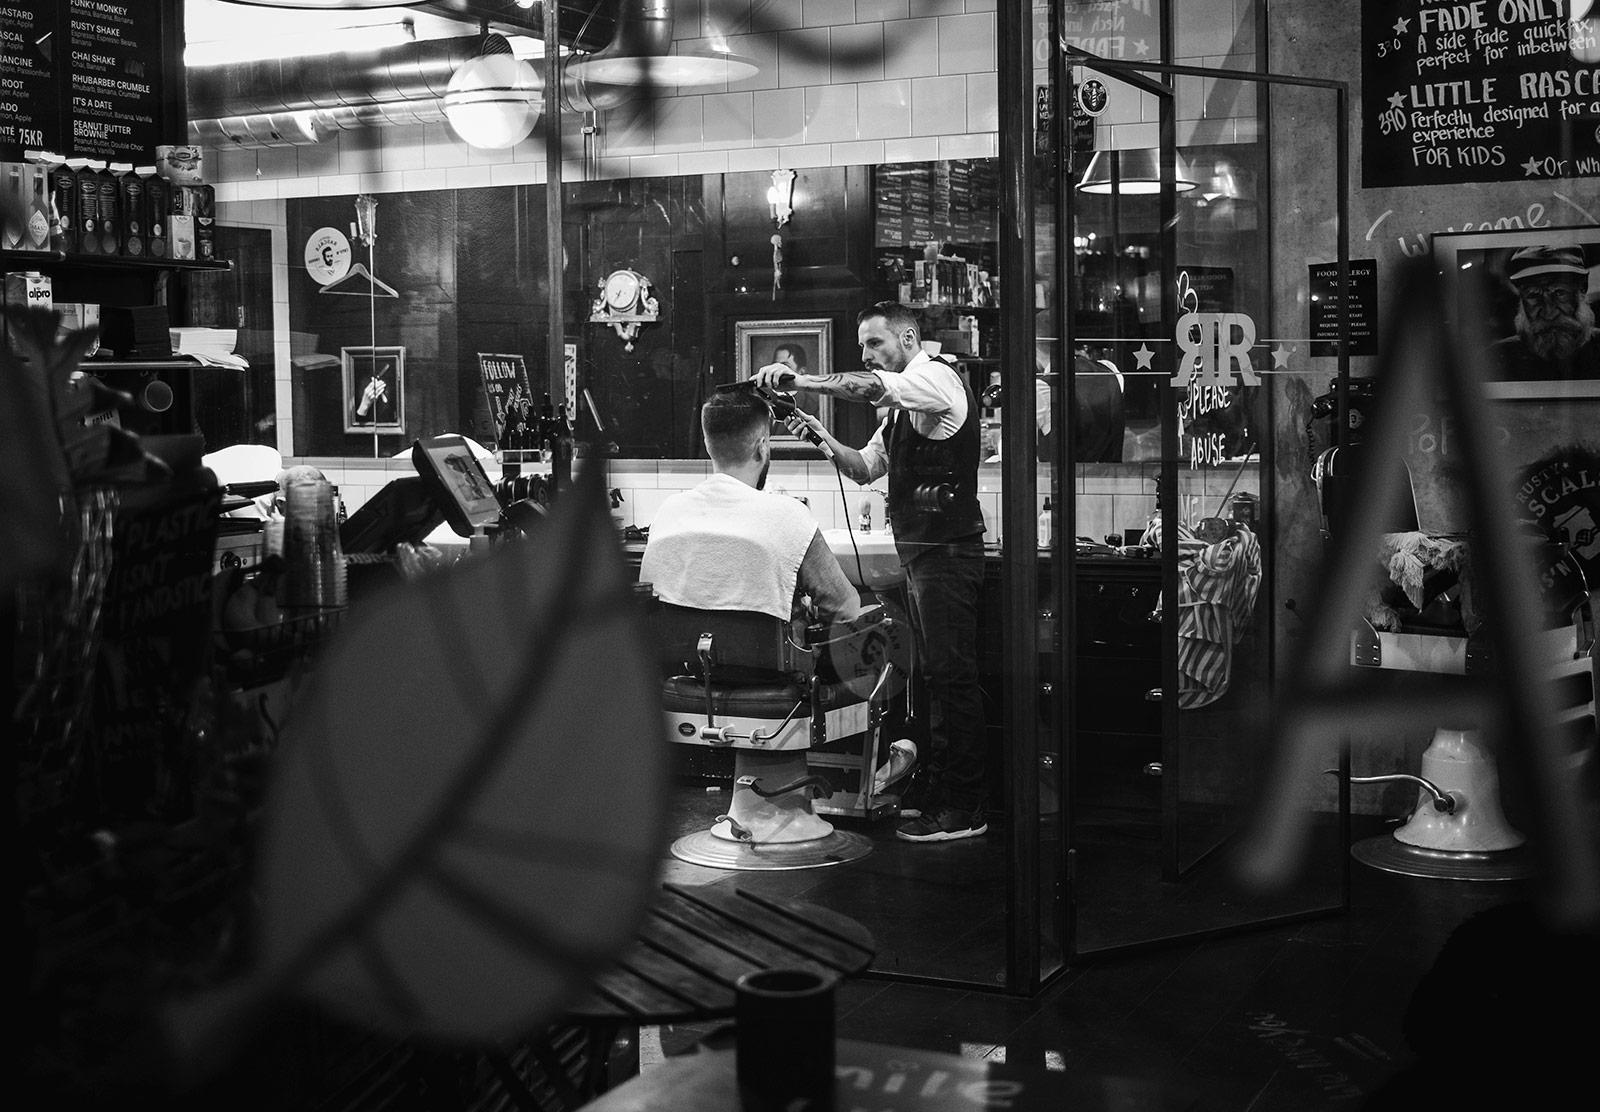 Man sat in barber chair